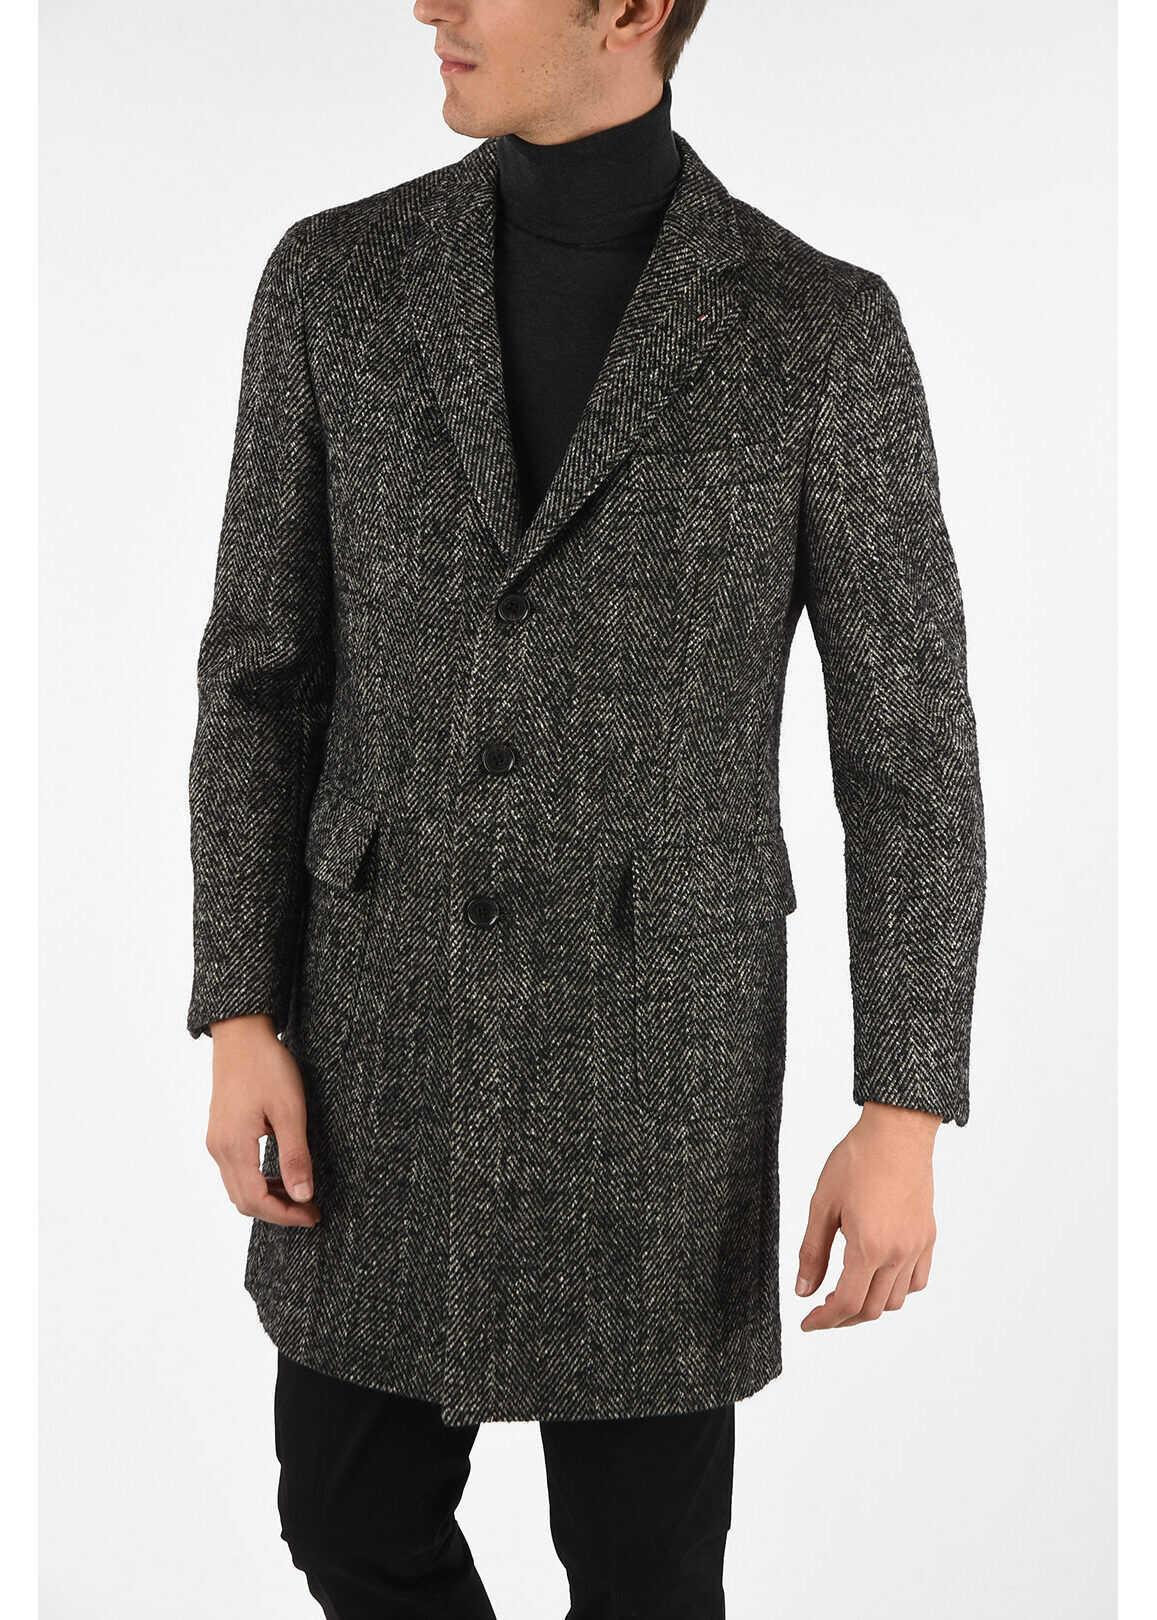 CORNELIANI CC COLLECTION plain herringbone three-quarter length coat GRAY imagine